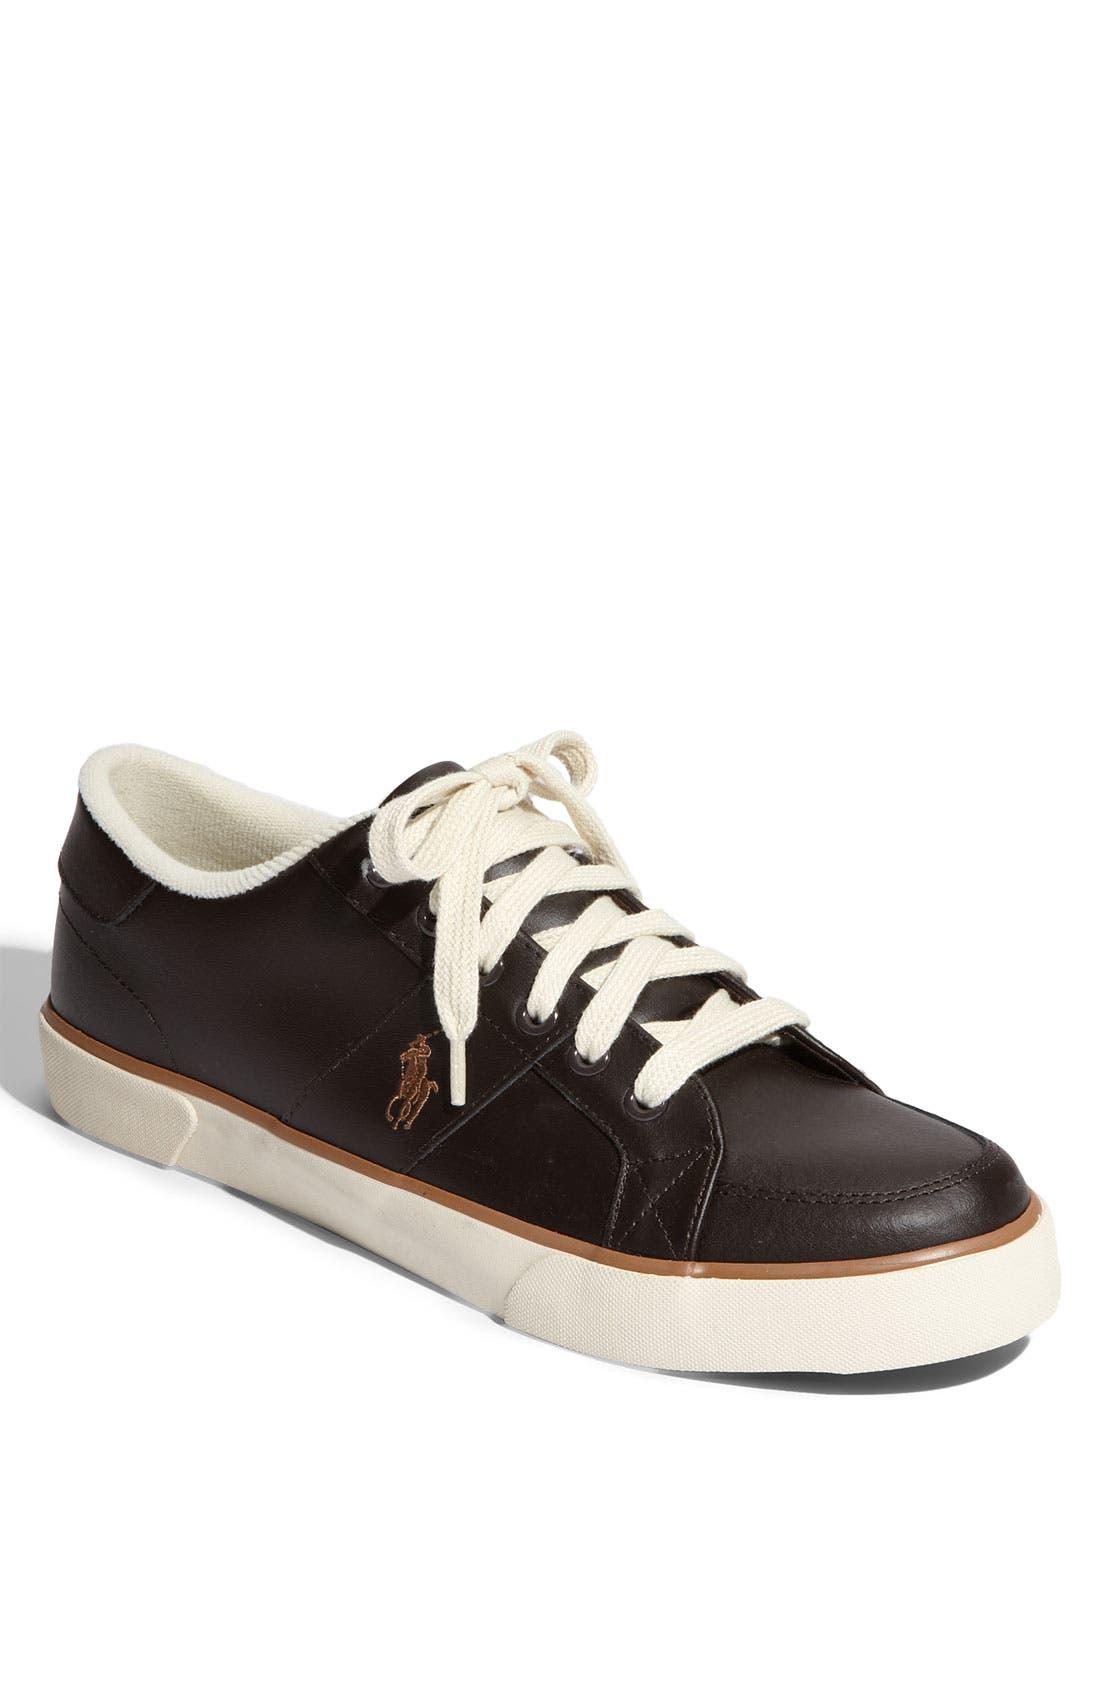 Alternate Image 1 Selected - Polo Ralph Lauren 'Harold' Sneaker